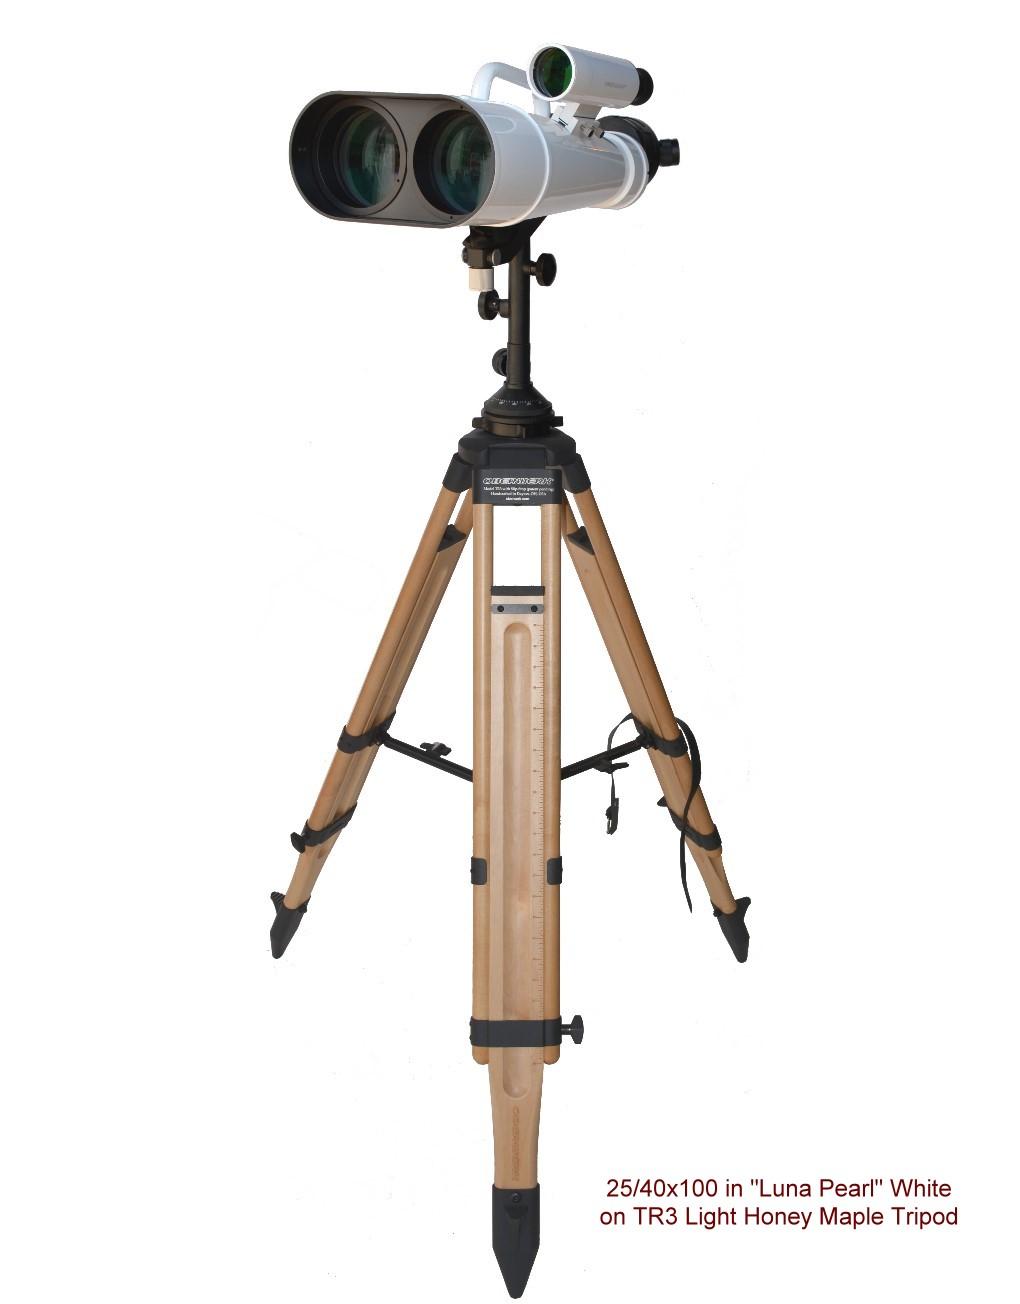 Oberwerk - Giant binoculars - YouTube